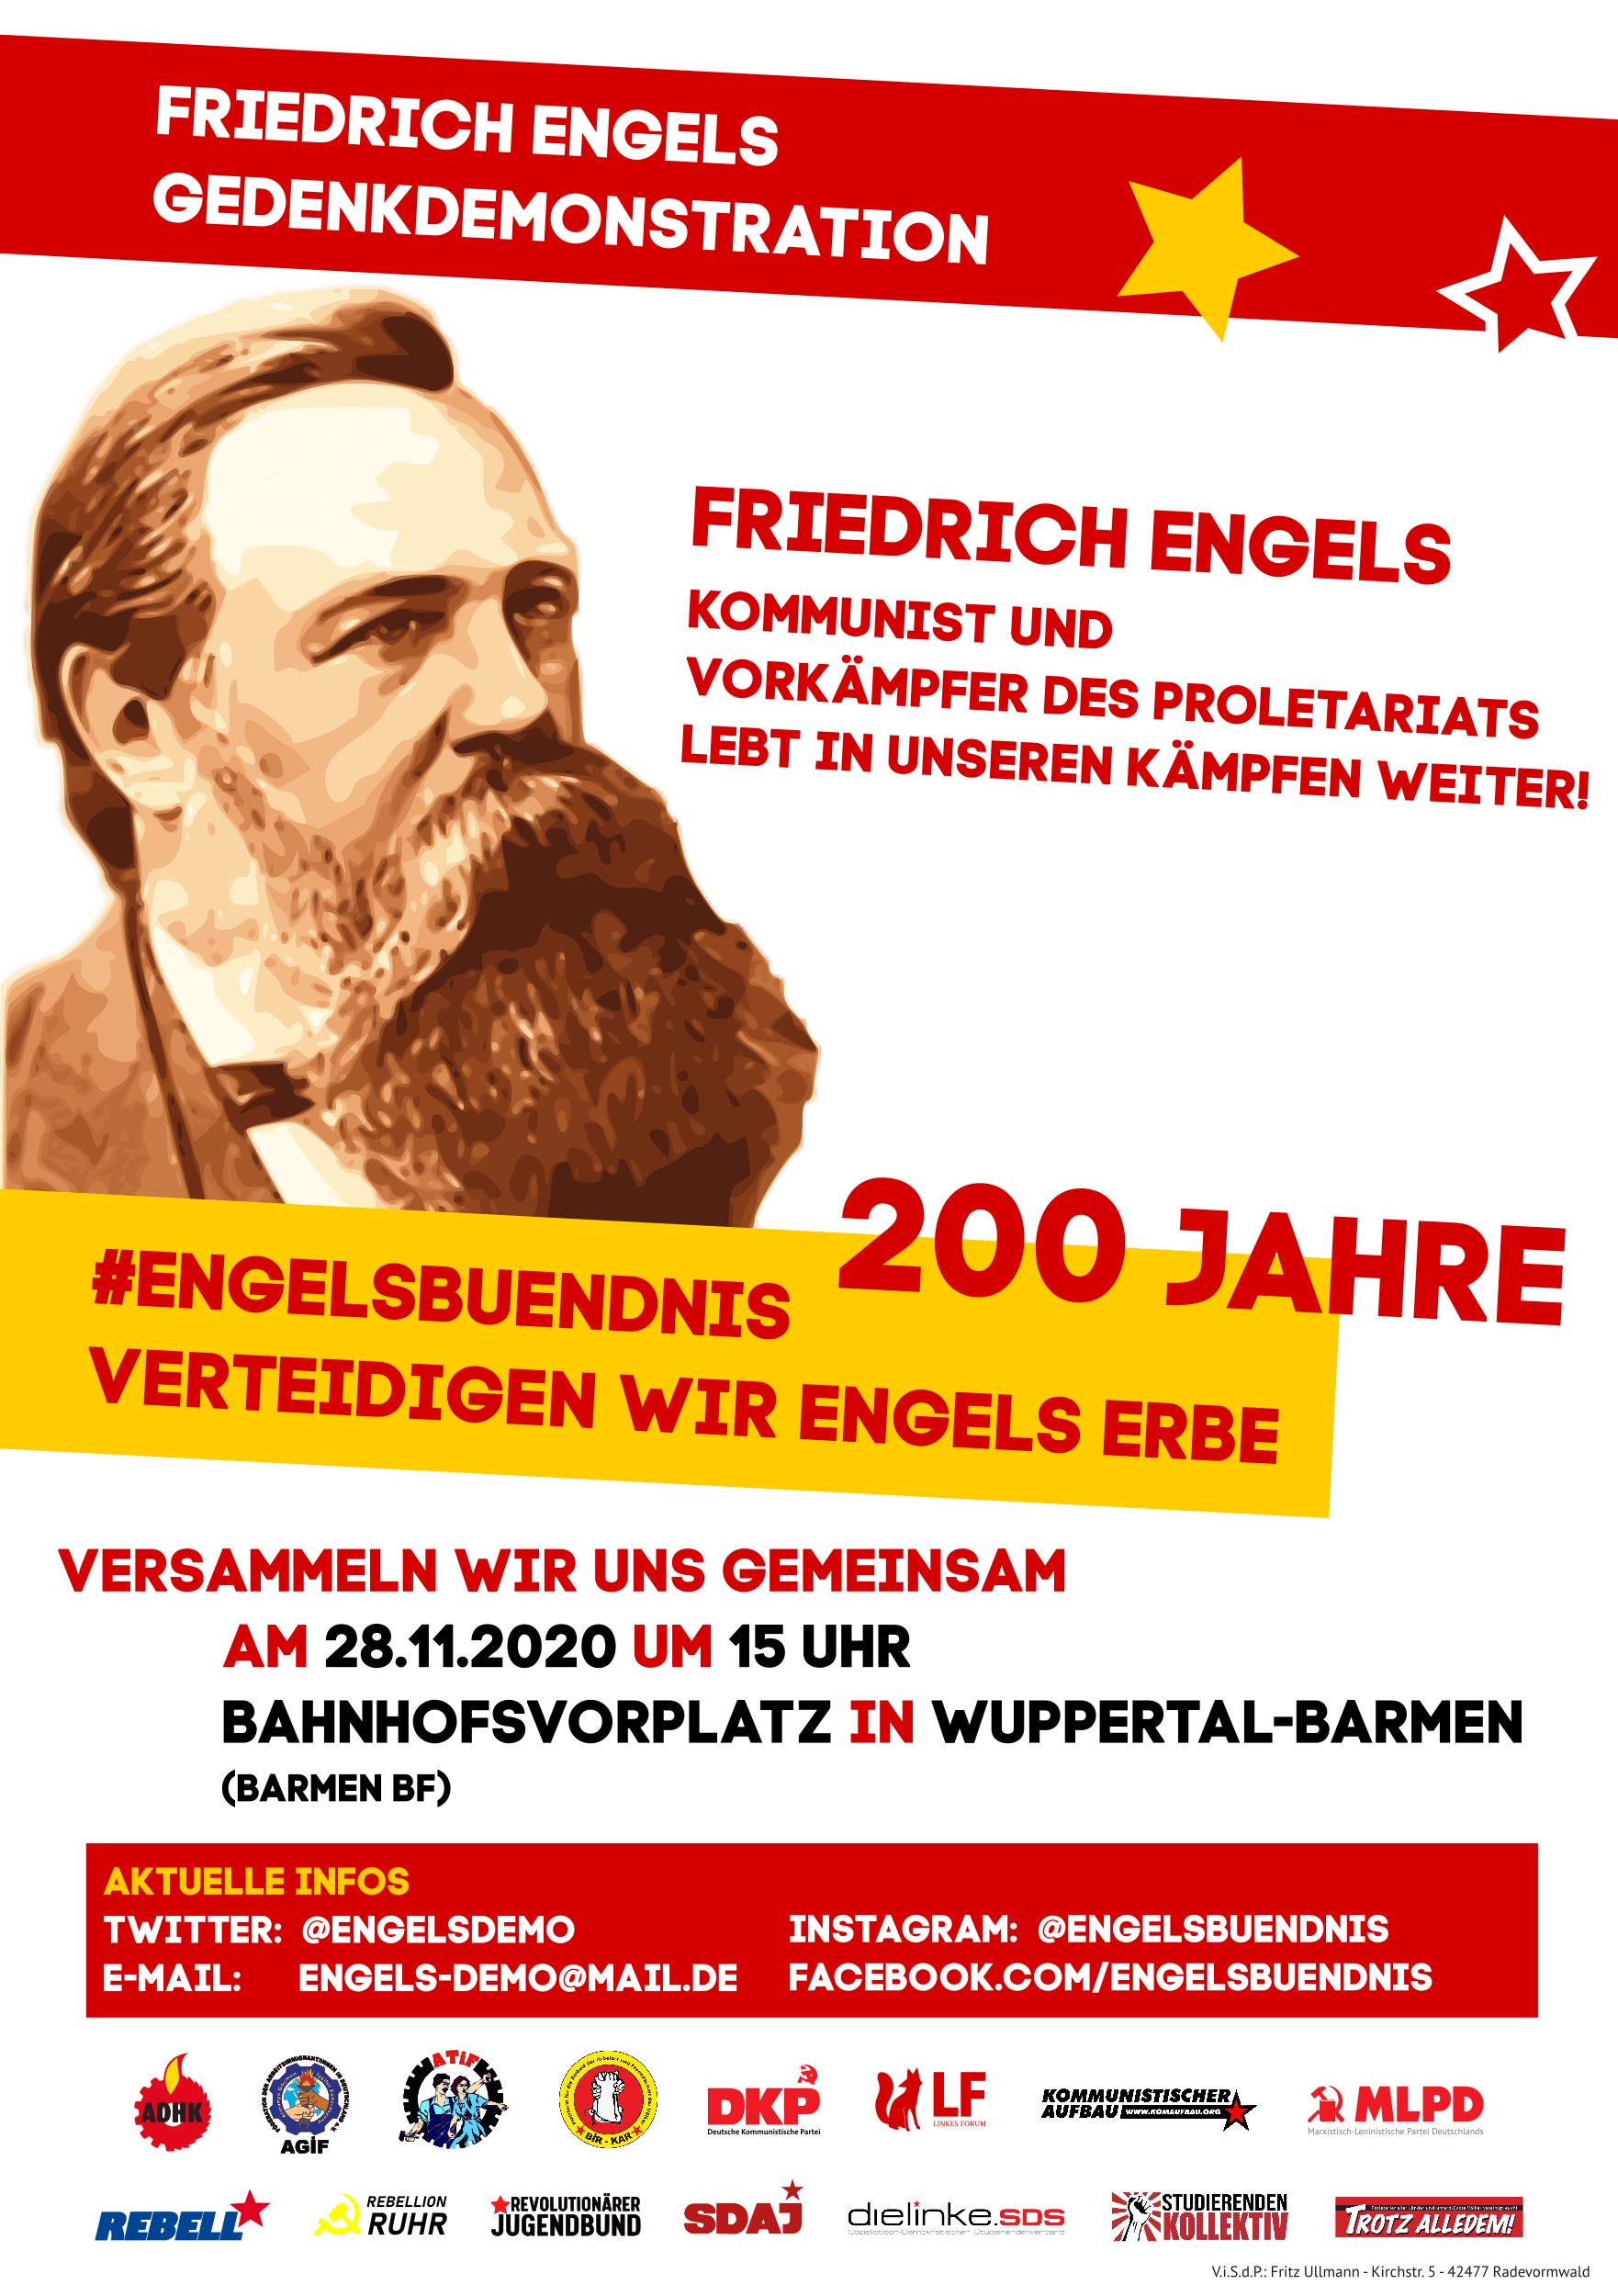 Engels Demo Plakat 2020 November 1762x2500